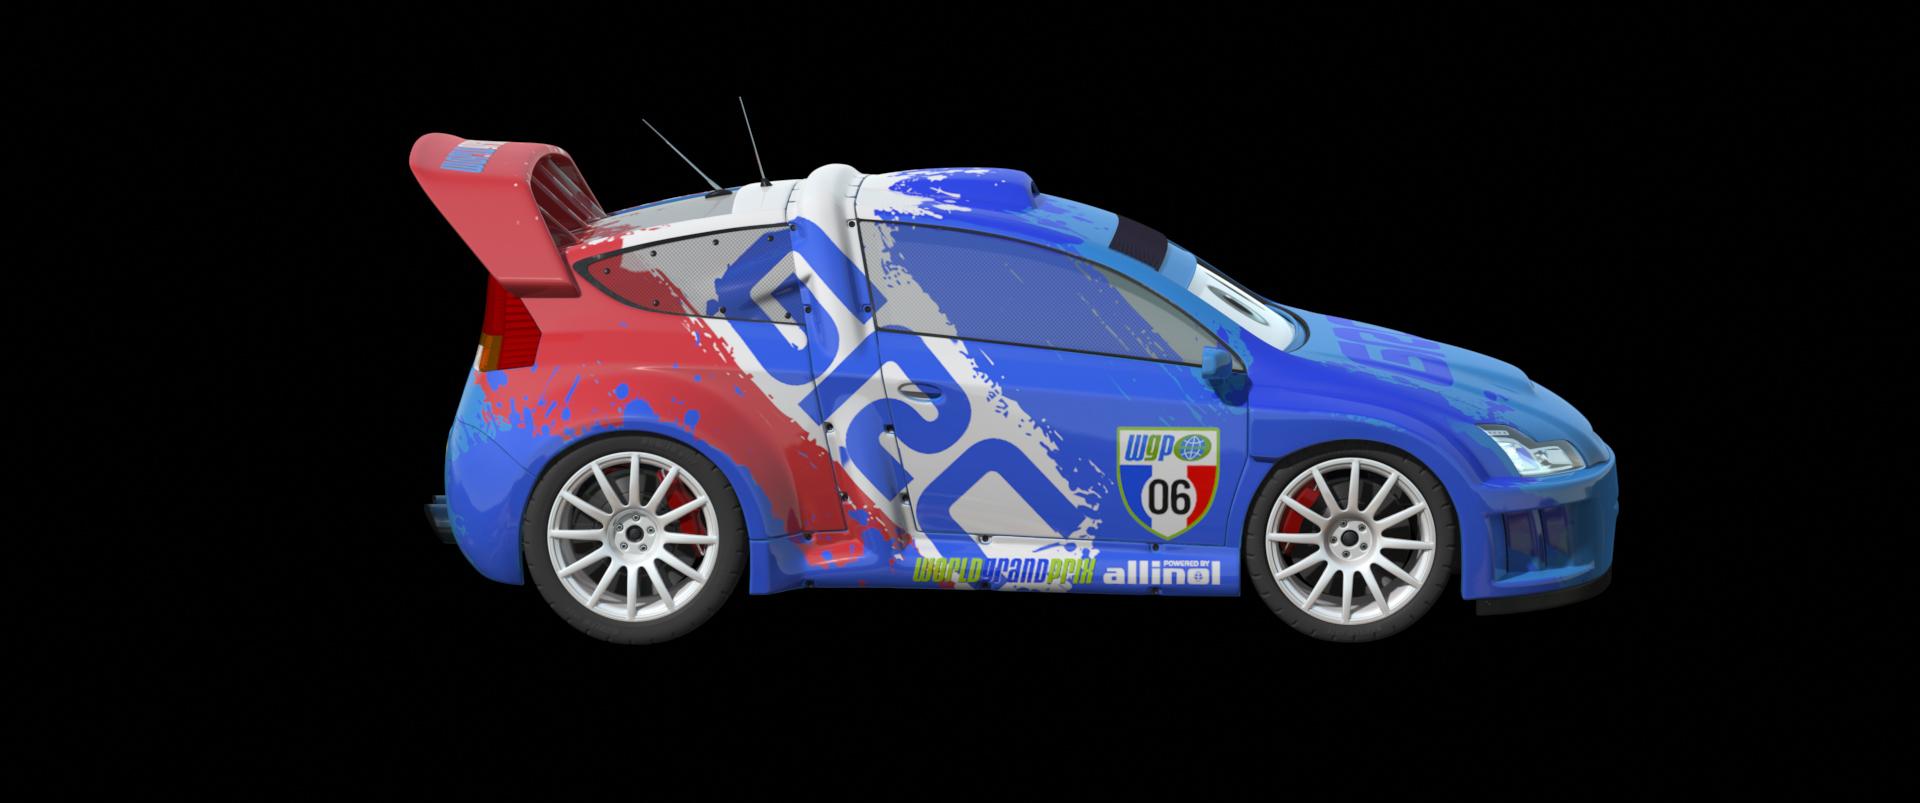 Cars 2 International Racers Line Up